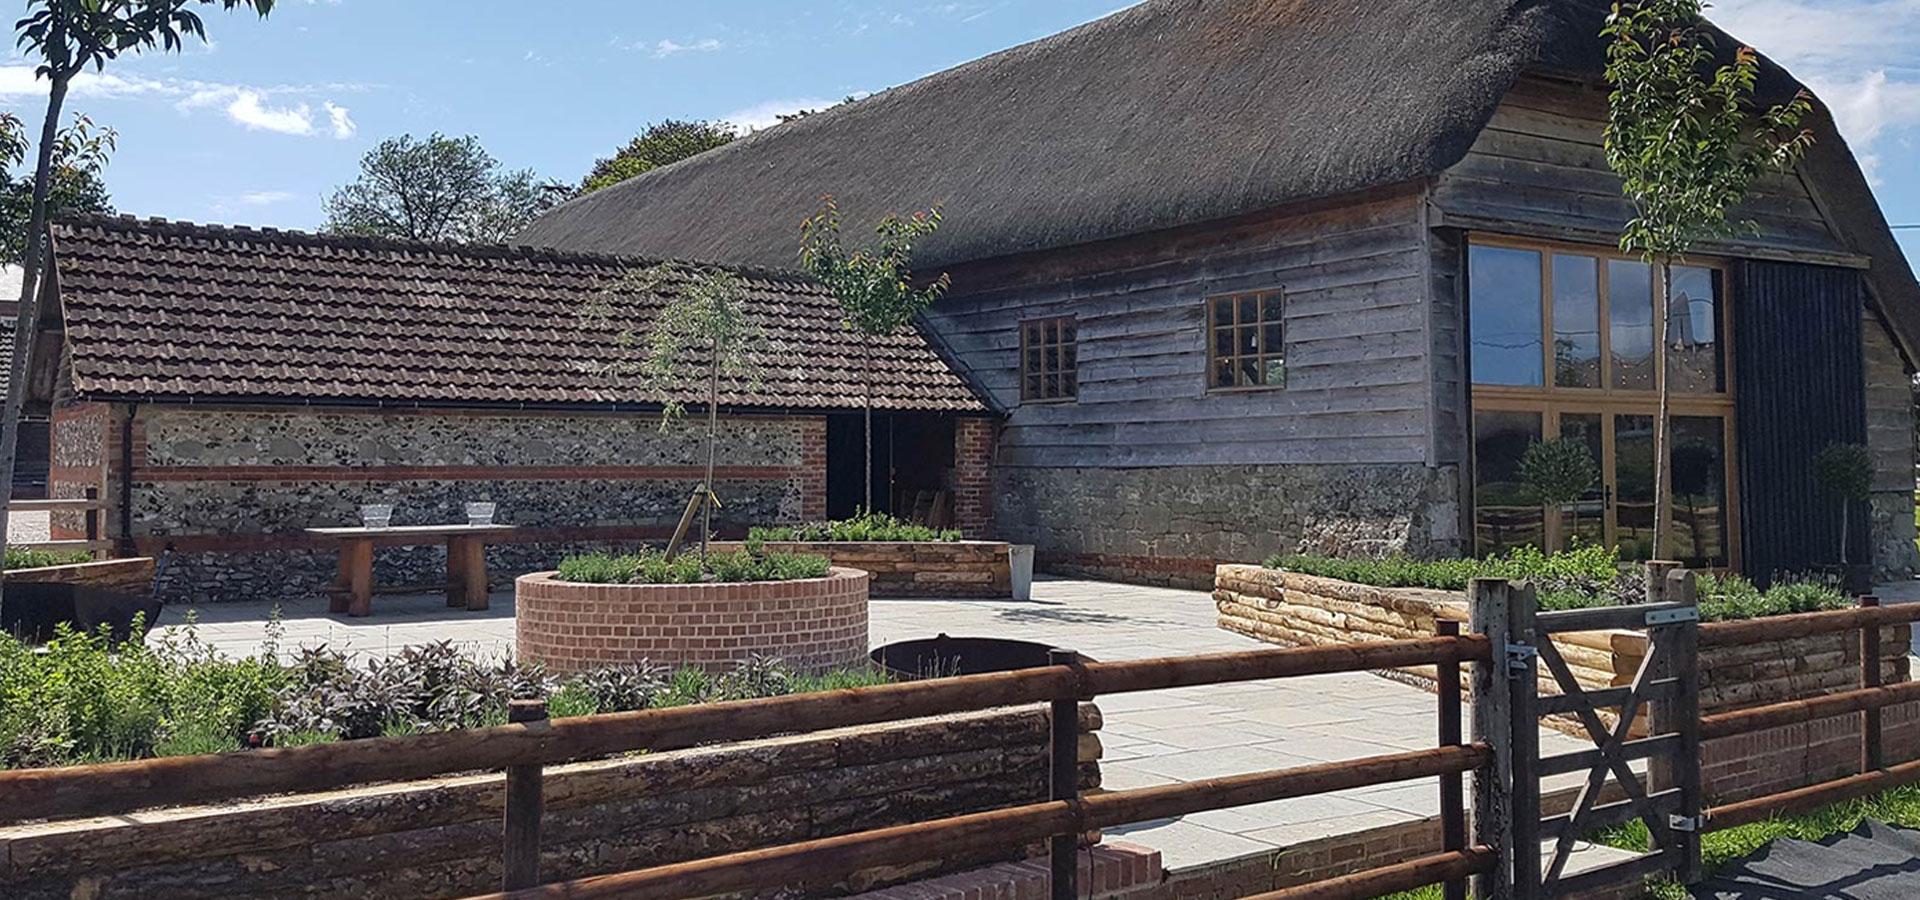 Bowerchalke Barn